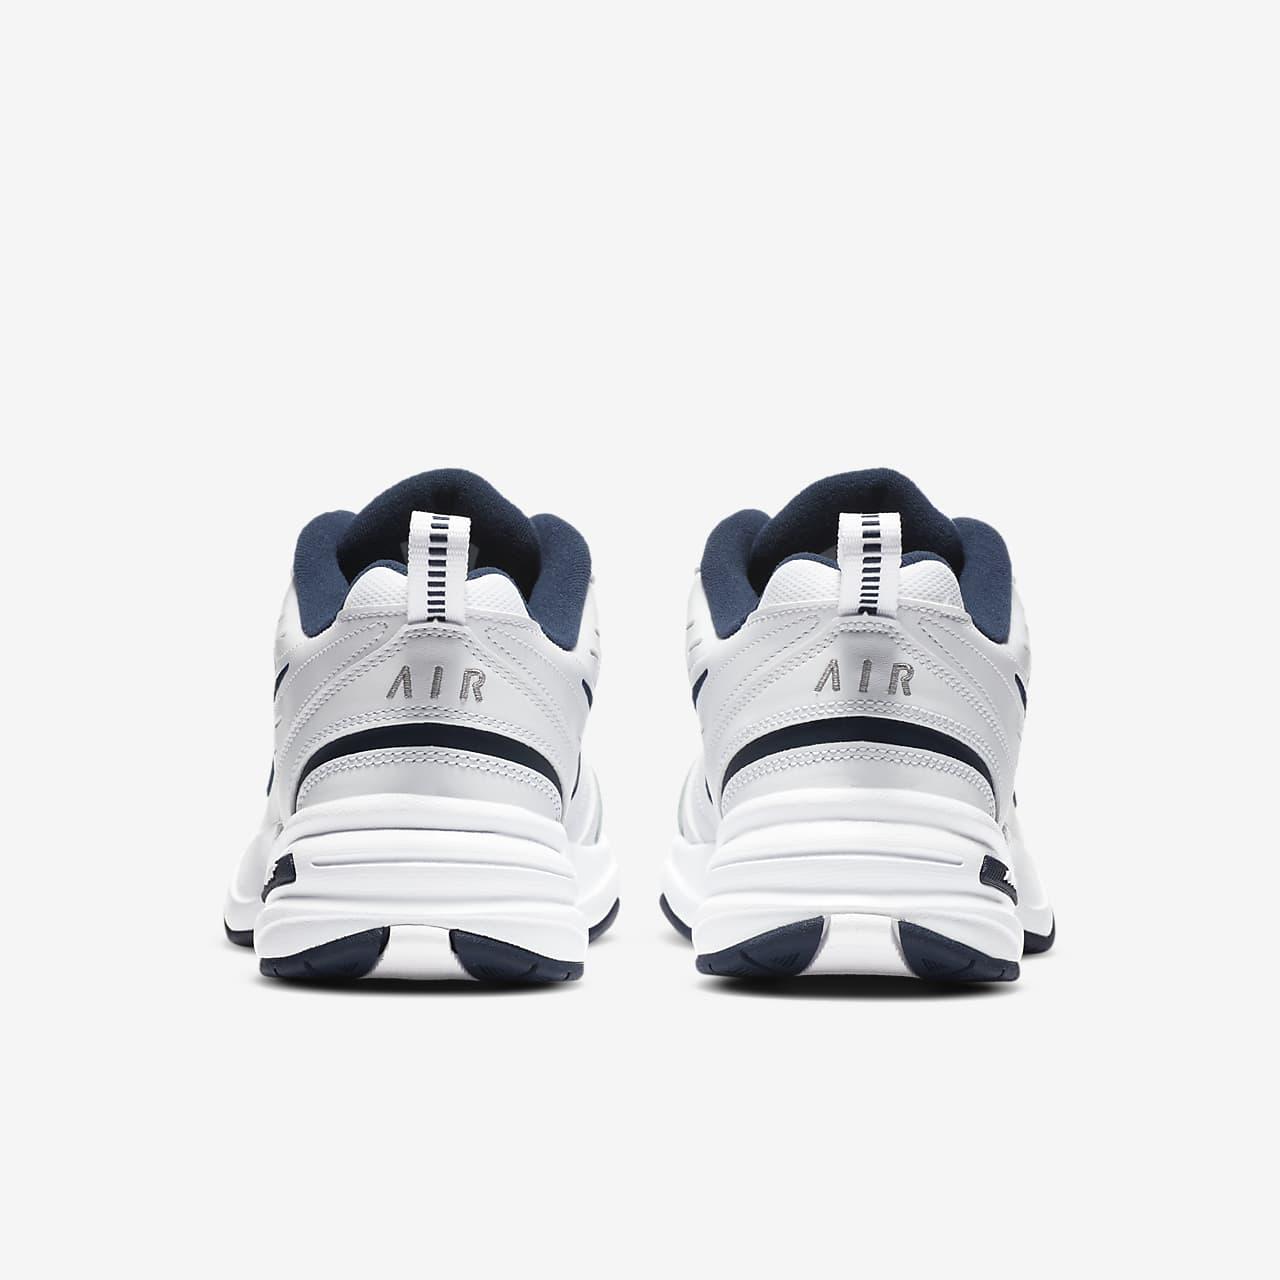 9fdacd09 ... Кроссовки для занятий в зале/на каждый день Nike Air Monarch IV